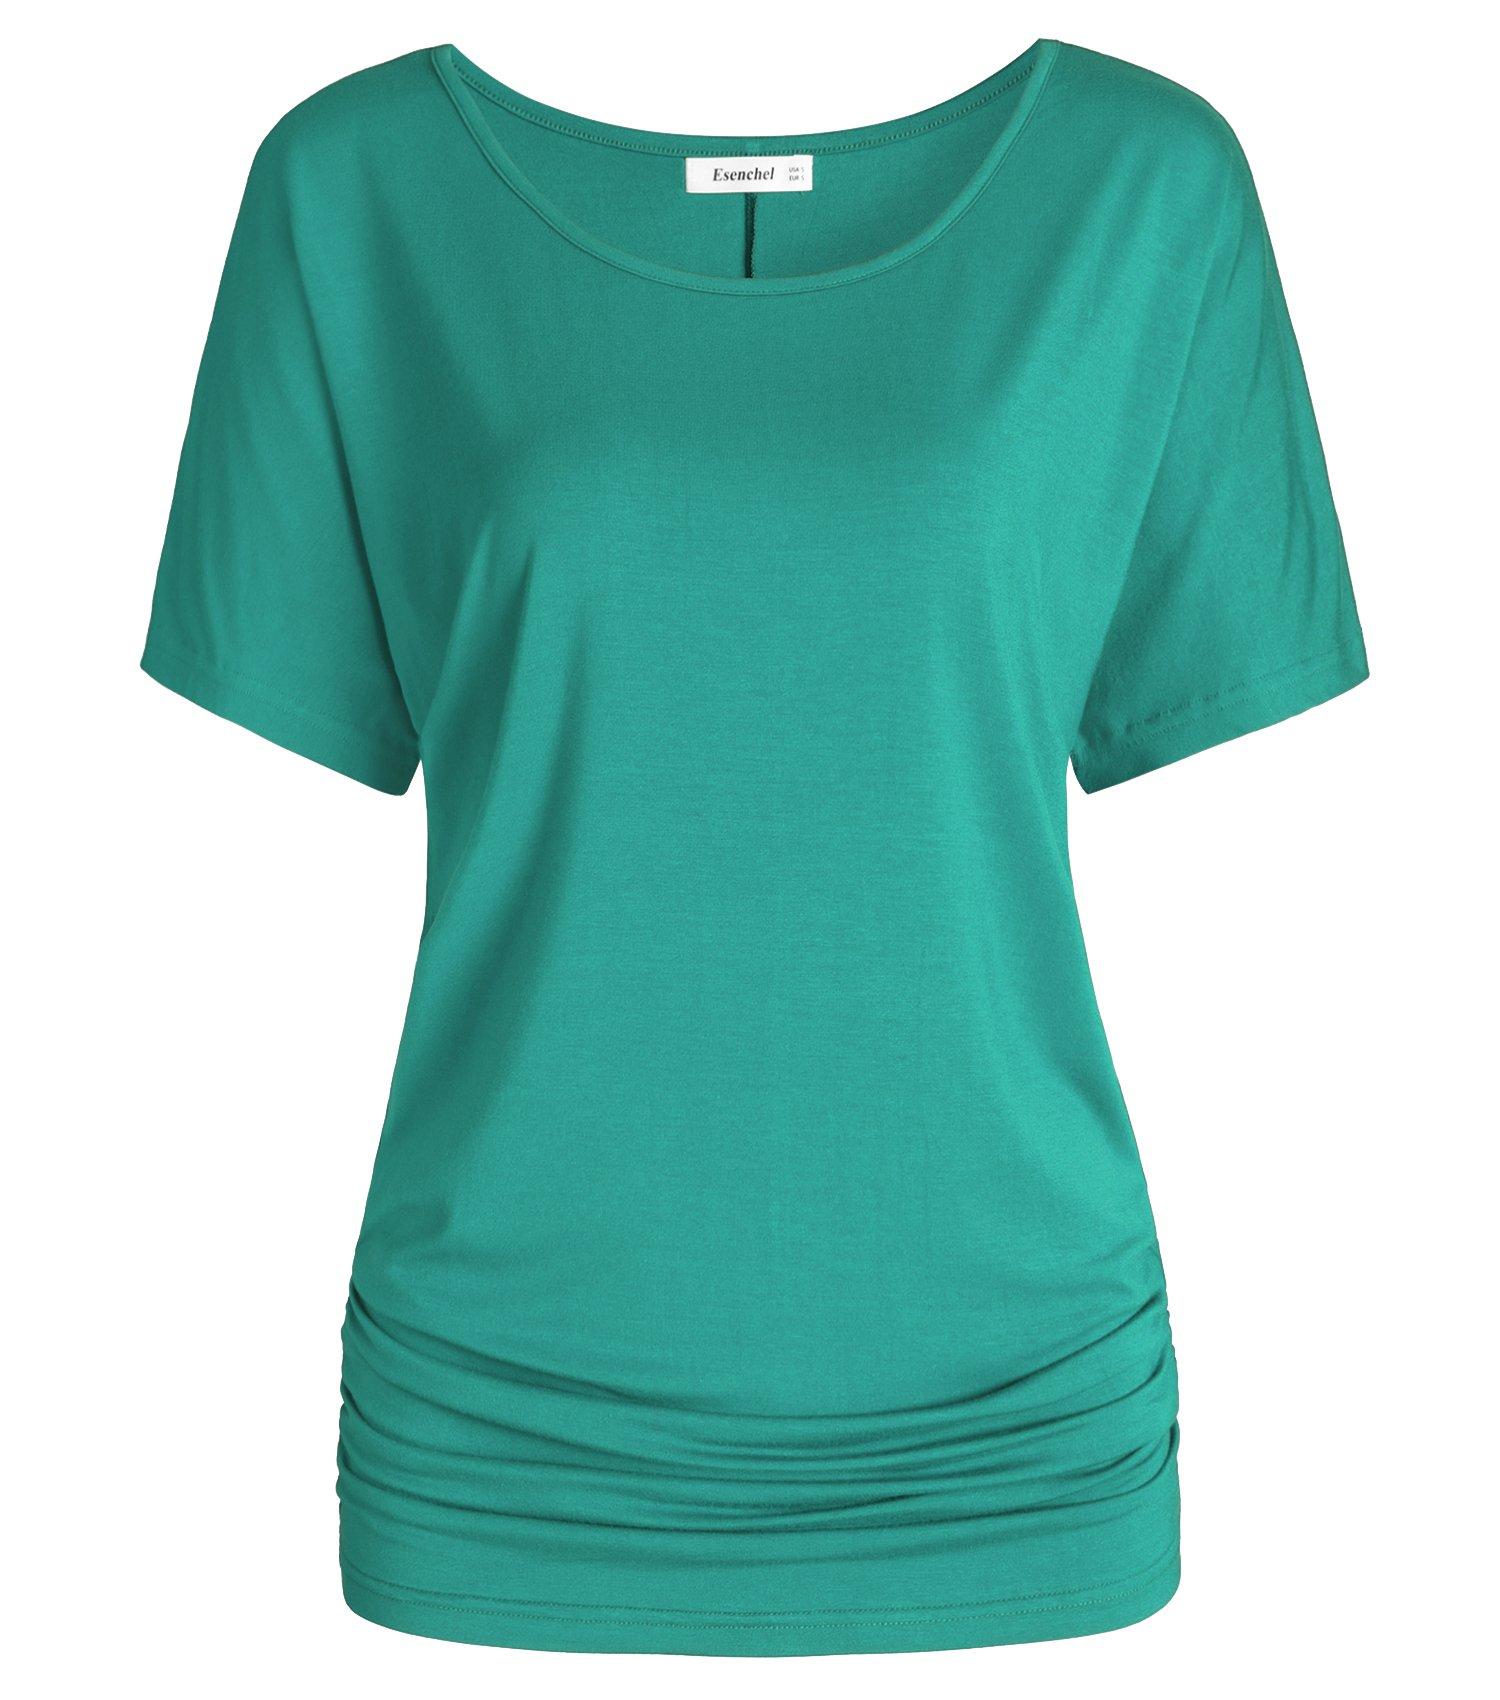 Esenchel Women's Short Sleeves Dolman Top Scoop Neck Drape Shirt